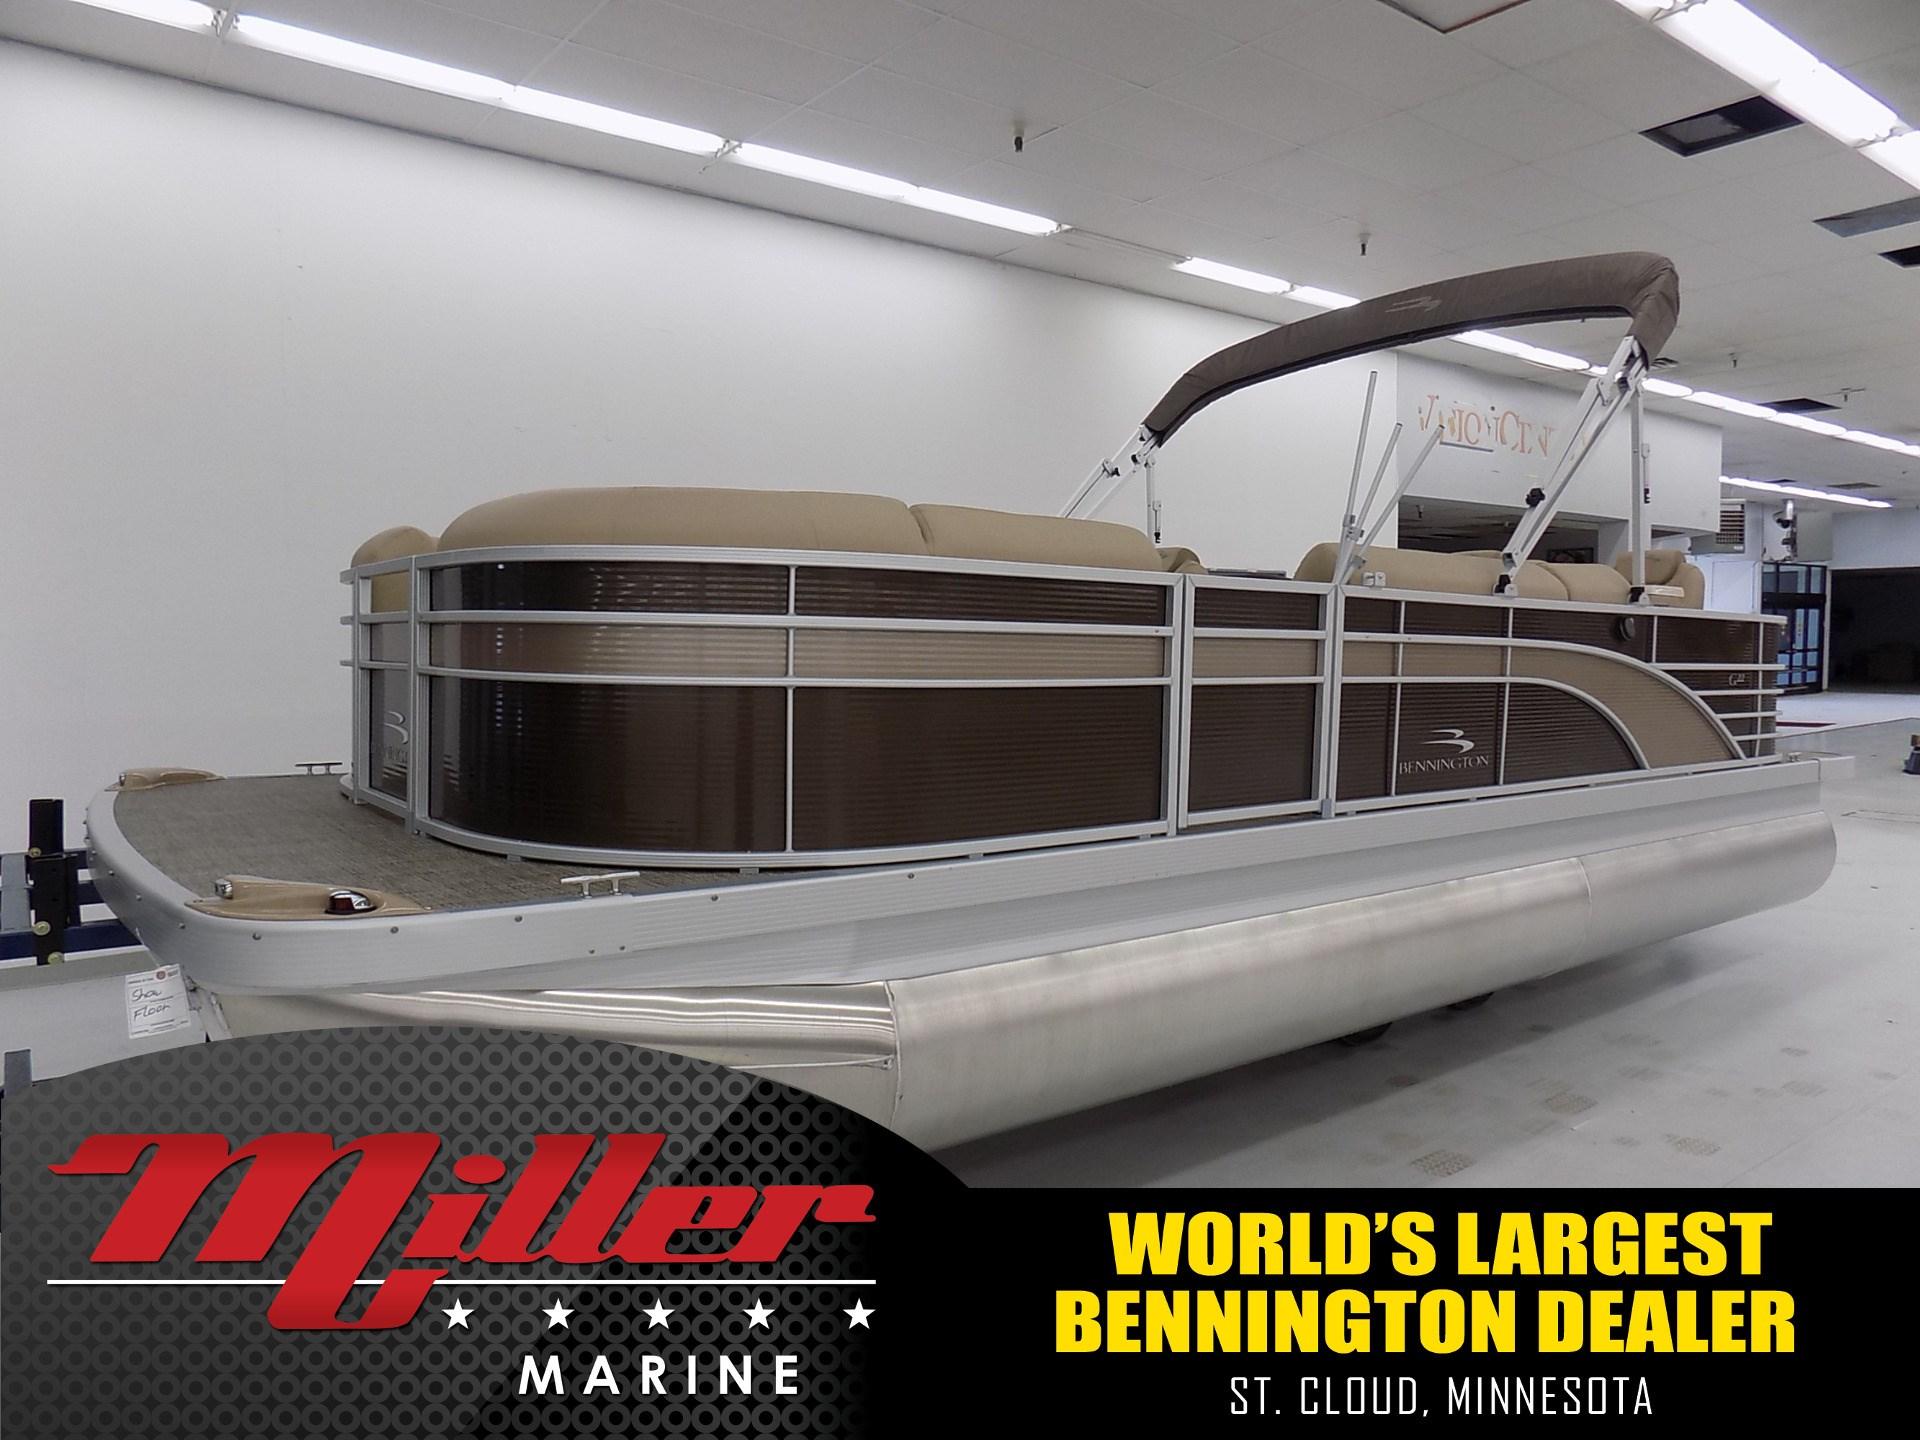 2016 Bennington 2250 GBR